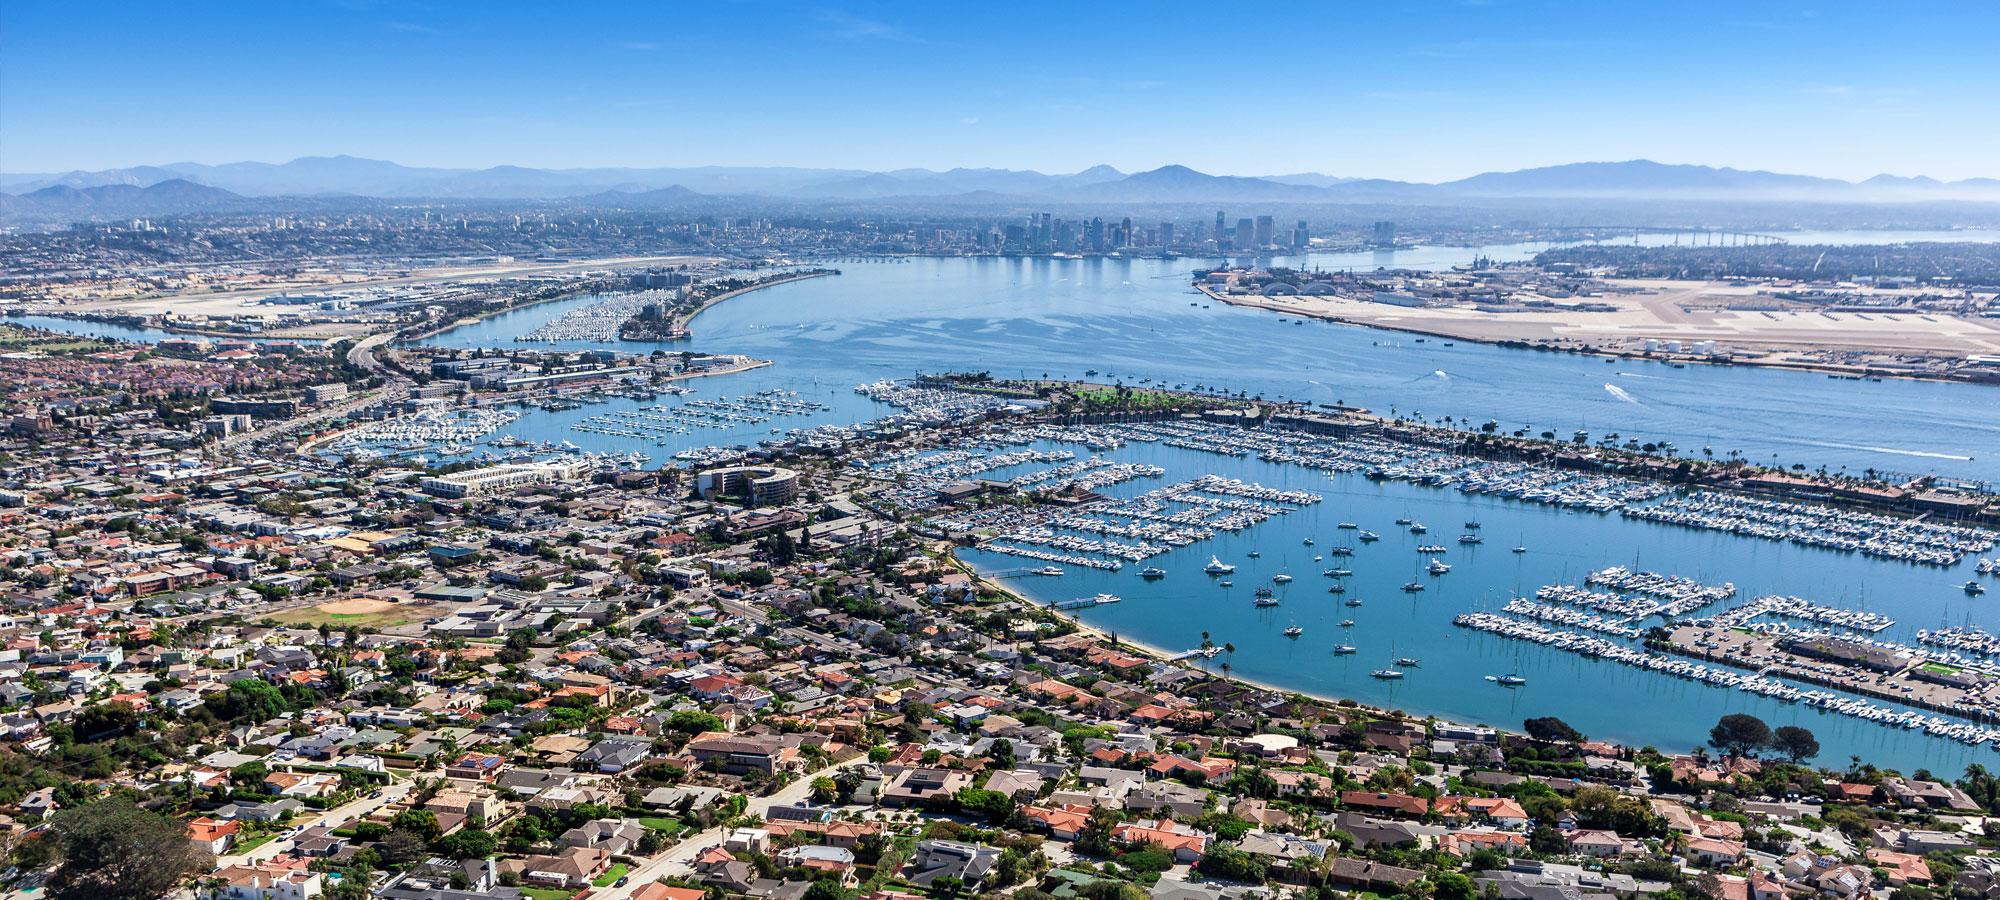 3345 Lucinda St. San Diego, CA 92106